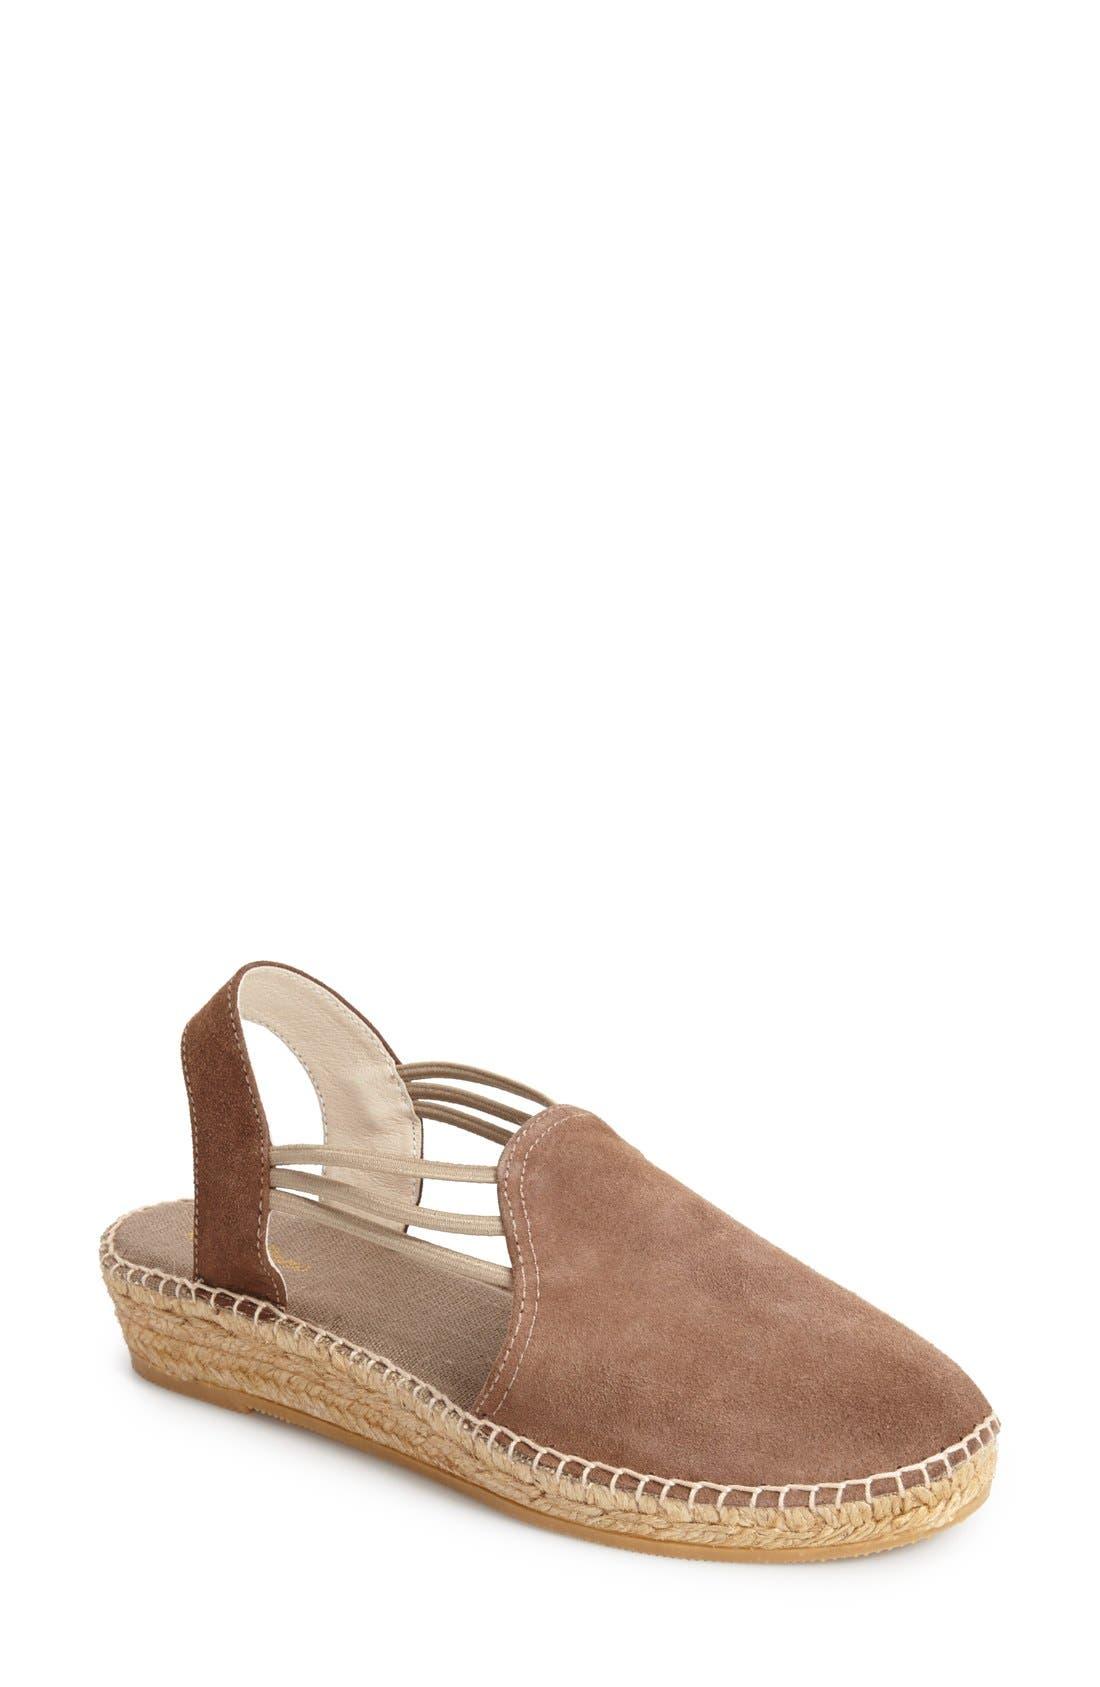 'Nuria' Suede Sandal,                         Main,                         color, Taupe